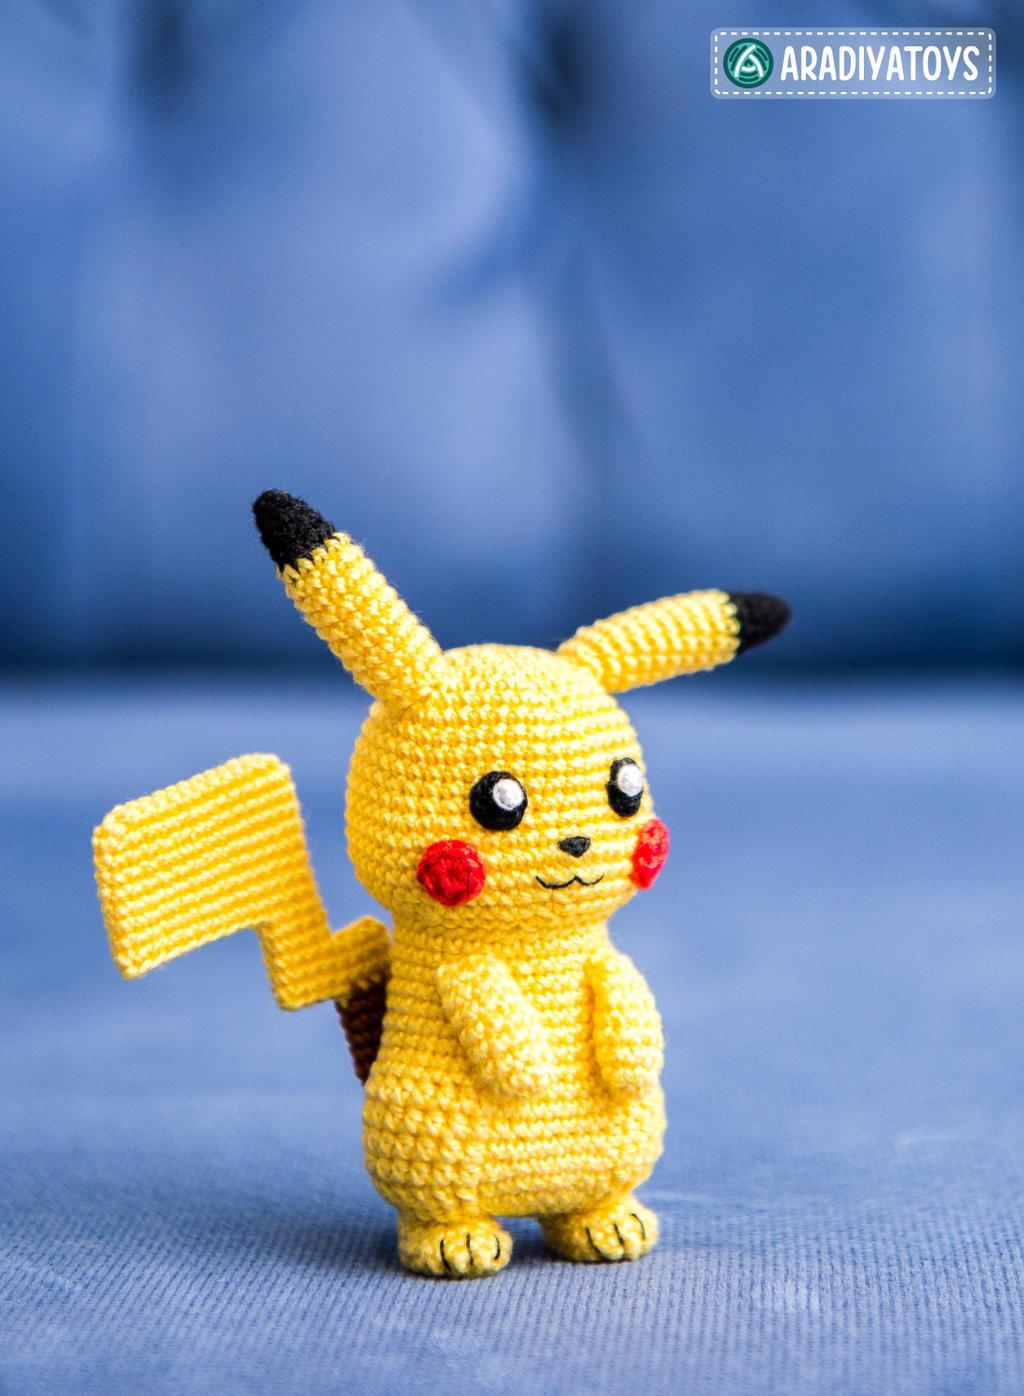 Amigurumi Sad Pokemon : Pikachu from Pokemon, amigurumi pattern by AradiyaToys ...